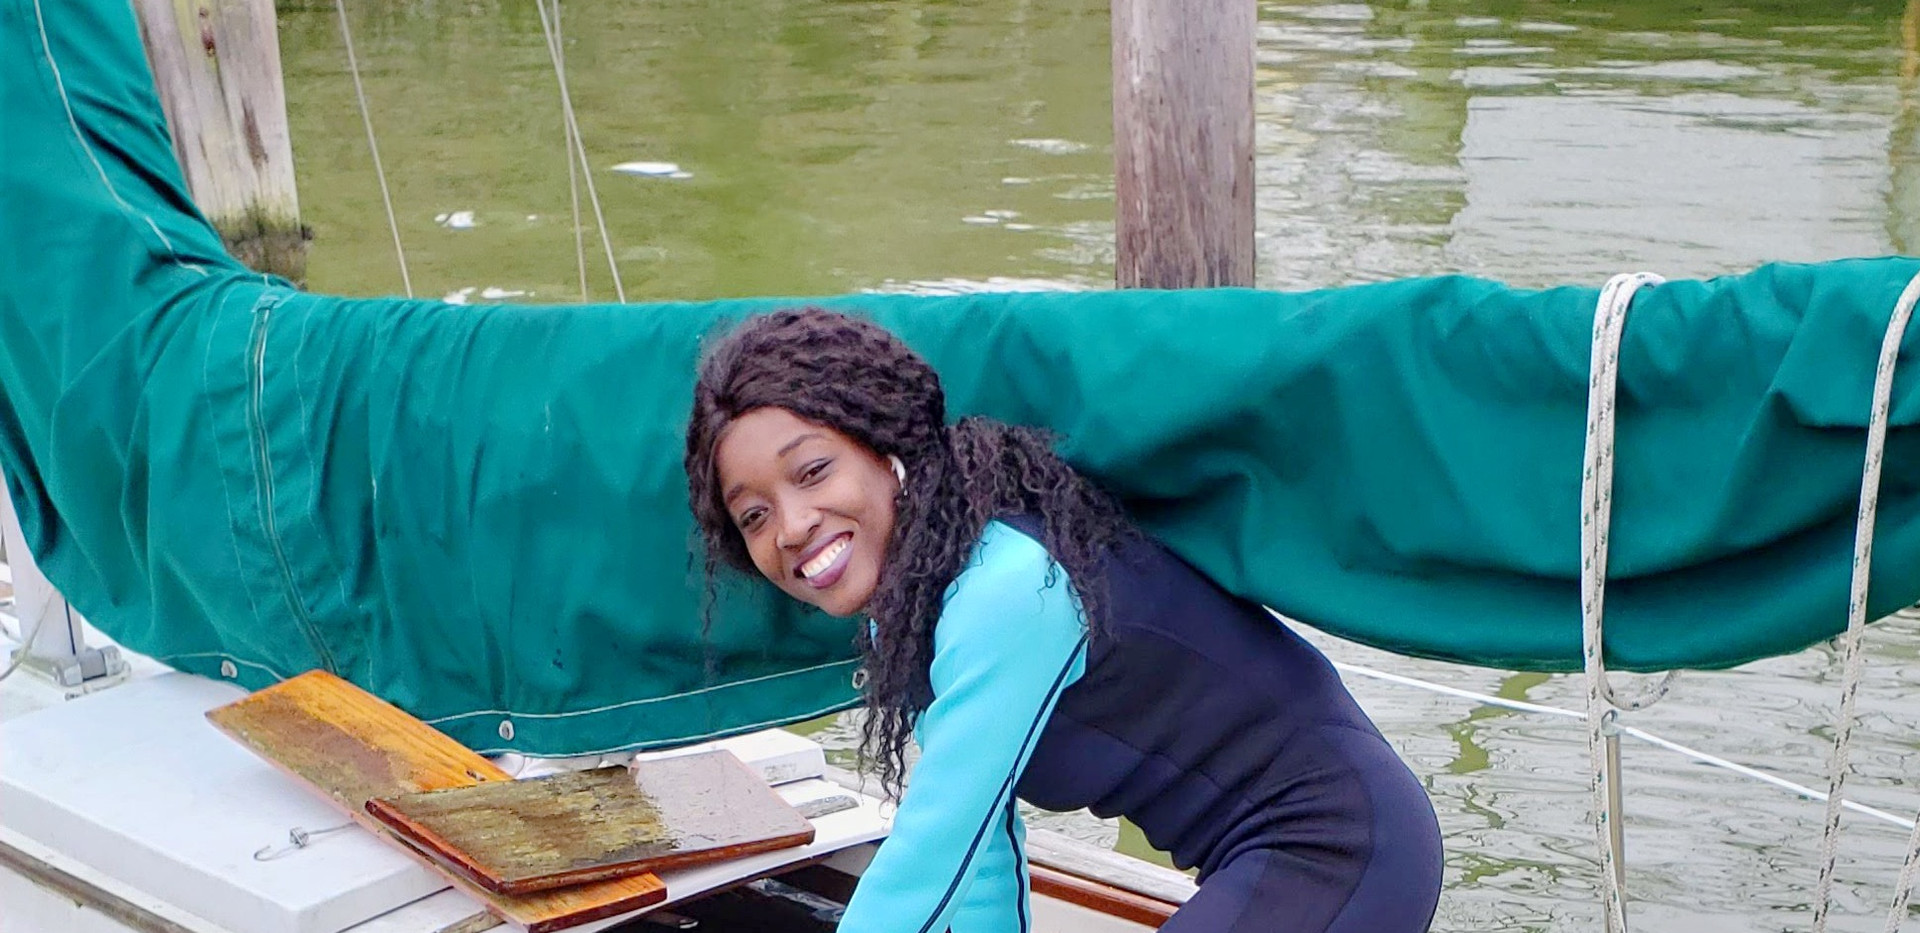 boat-female-worker-tools-electri